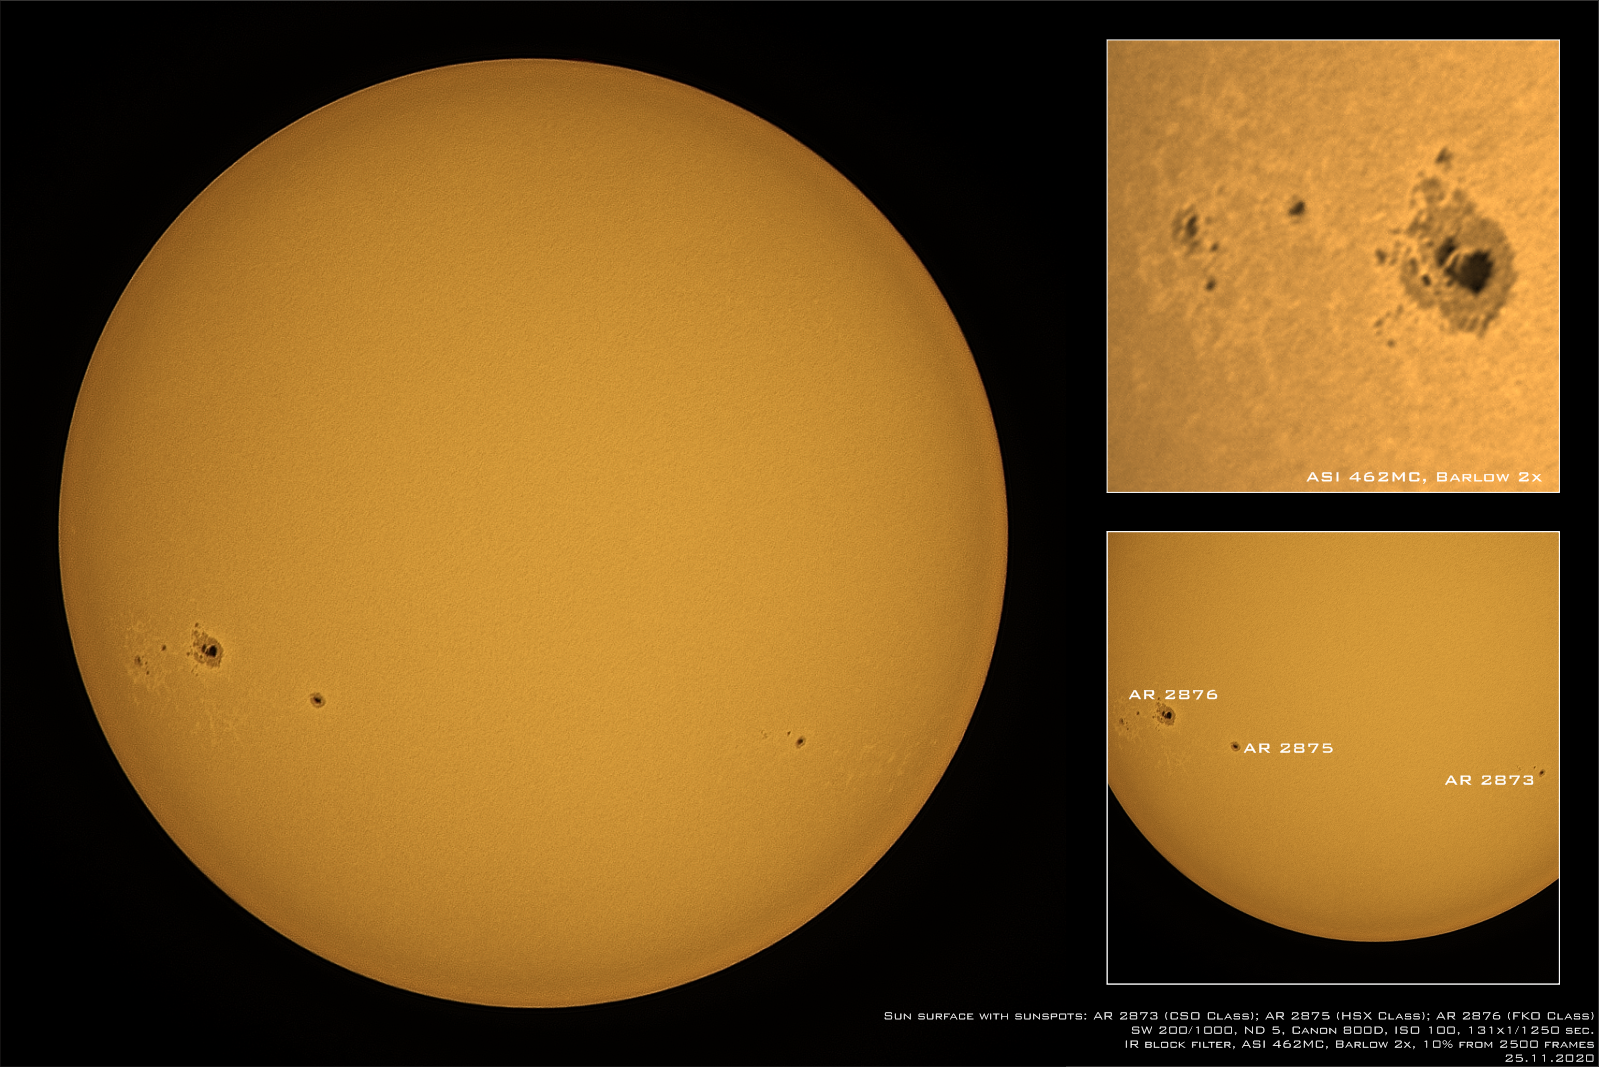 Sun_25_11_2020.png.31010bfb7b766bfe3ccd1bbb7fac26b0.png